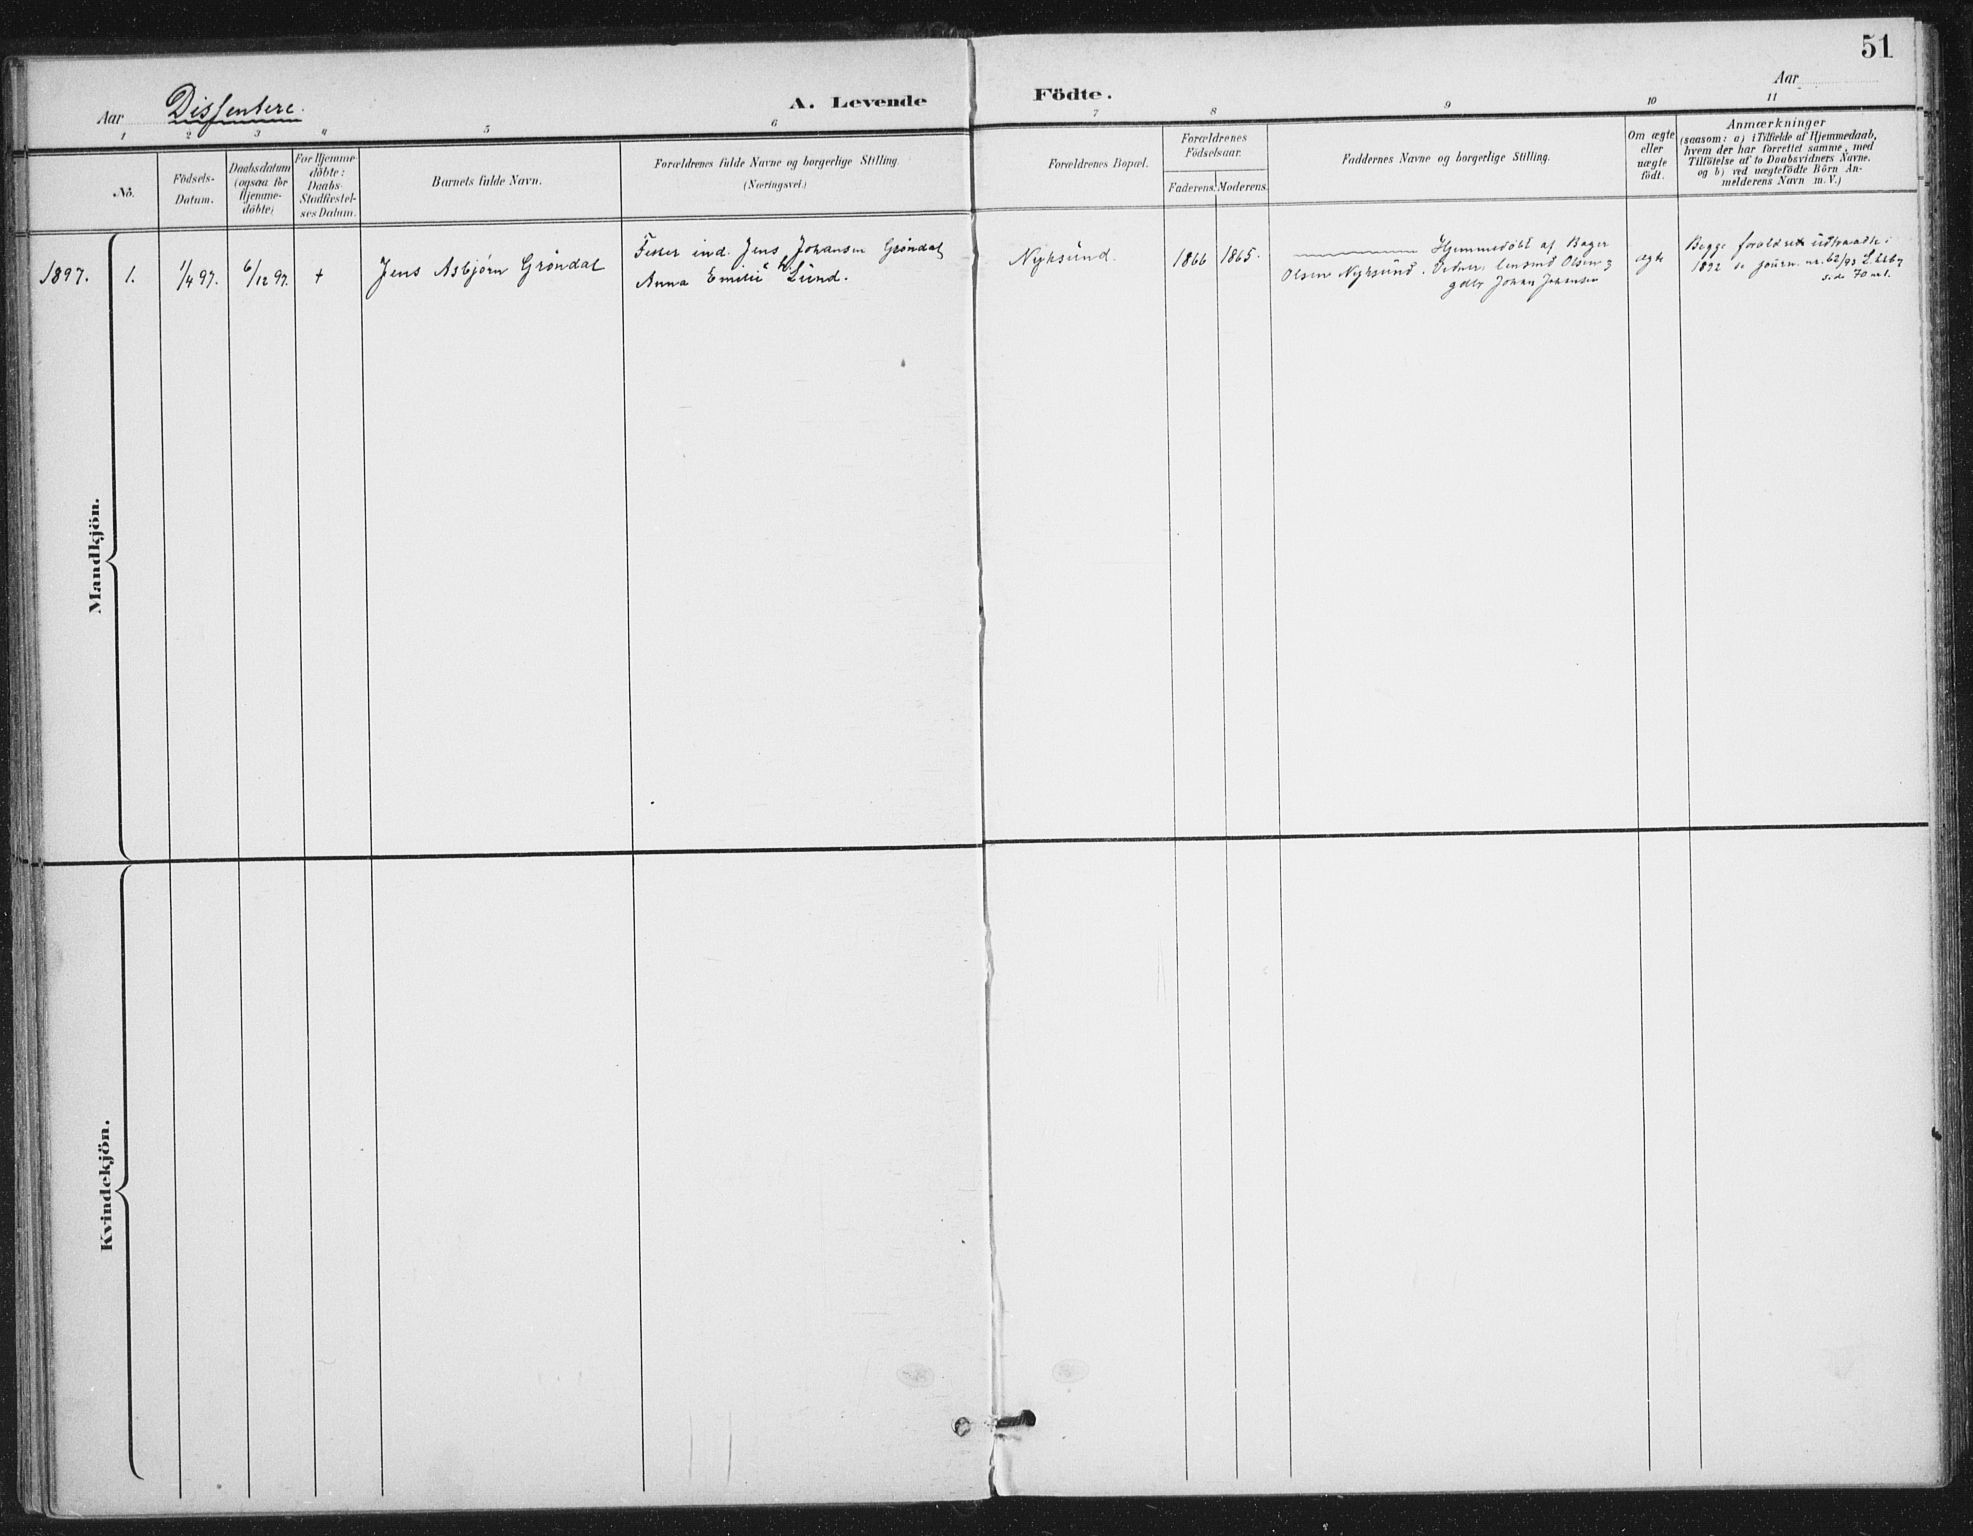 SAT, Ministerialprotokoller, klokkerbøker og fødselsregistre - Nordland, 894/L1356: Ministerialbok nr. 894A02, 1897-1914, s. 51